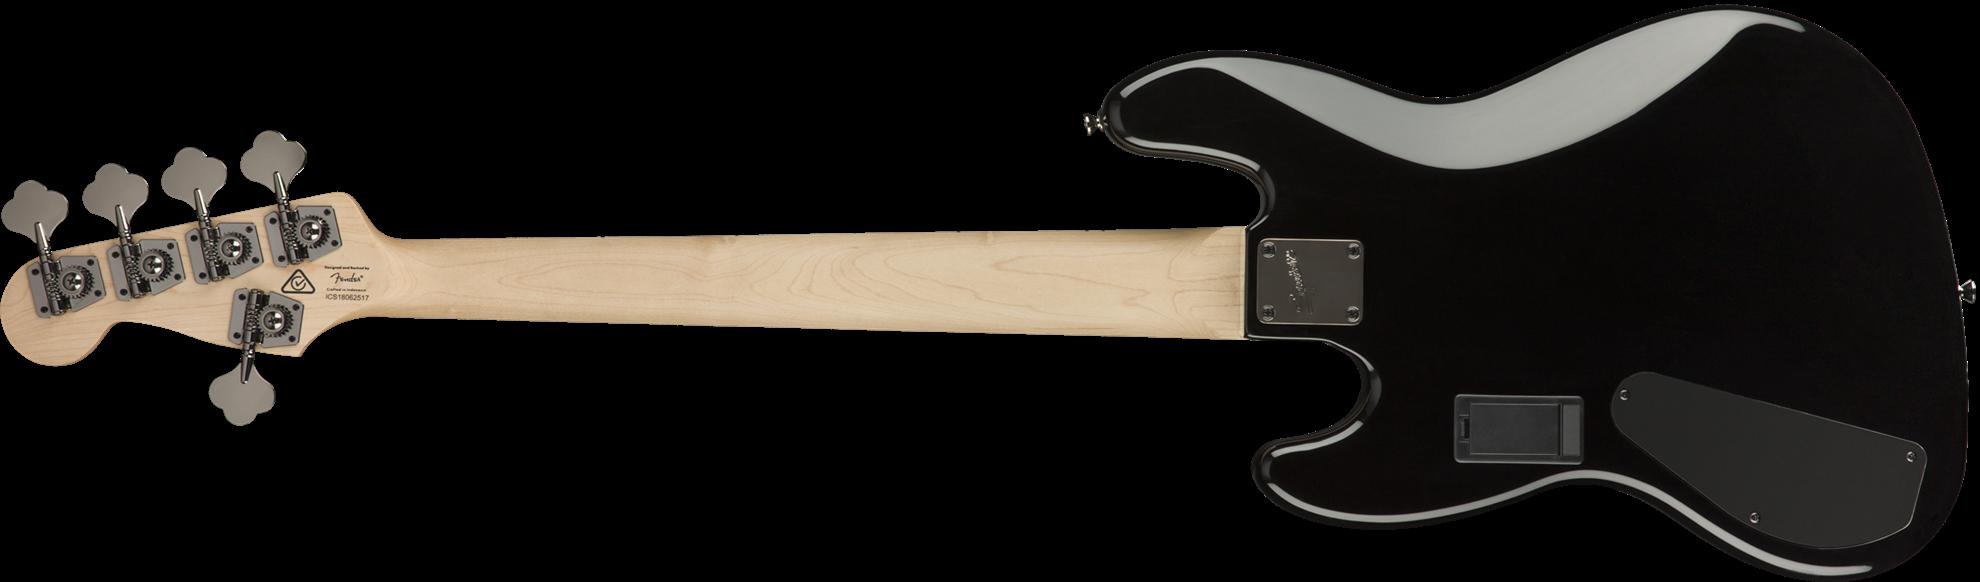 Squier Contemporary Active Jazz Bass Guitar HH V Black - Back